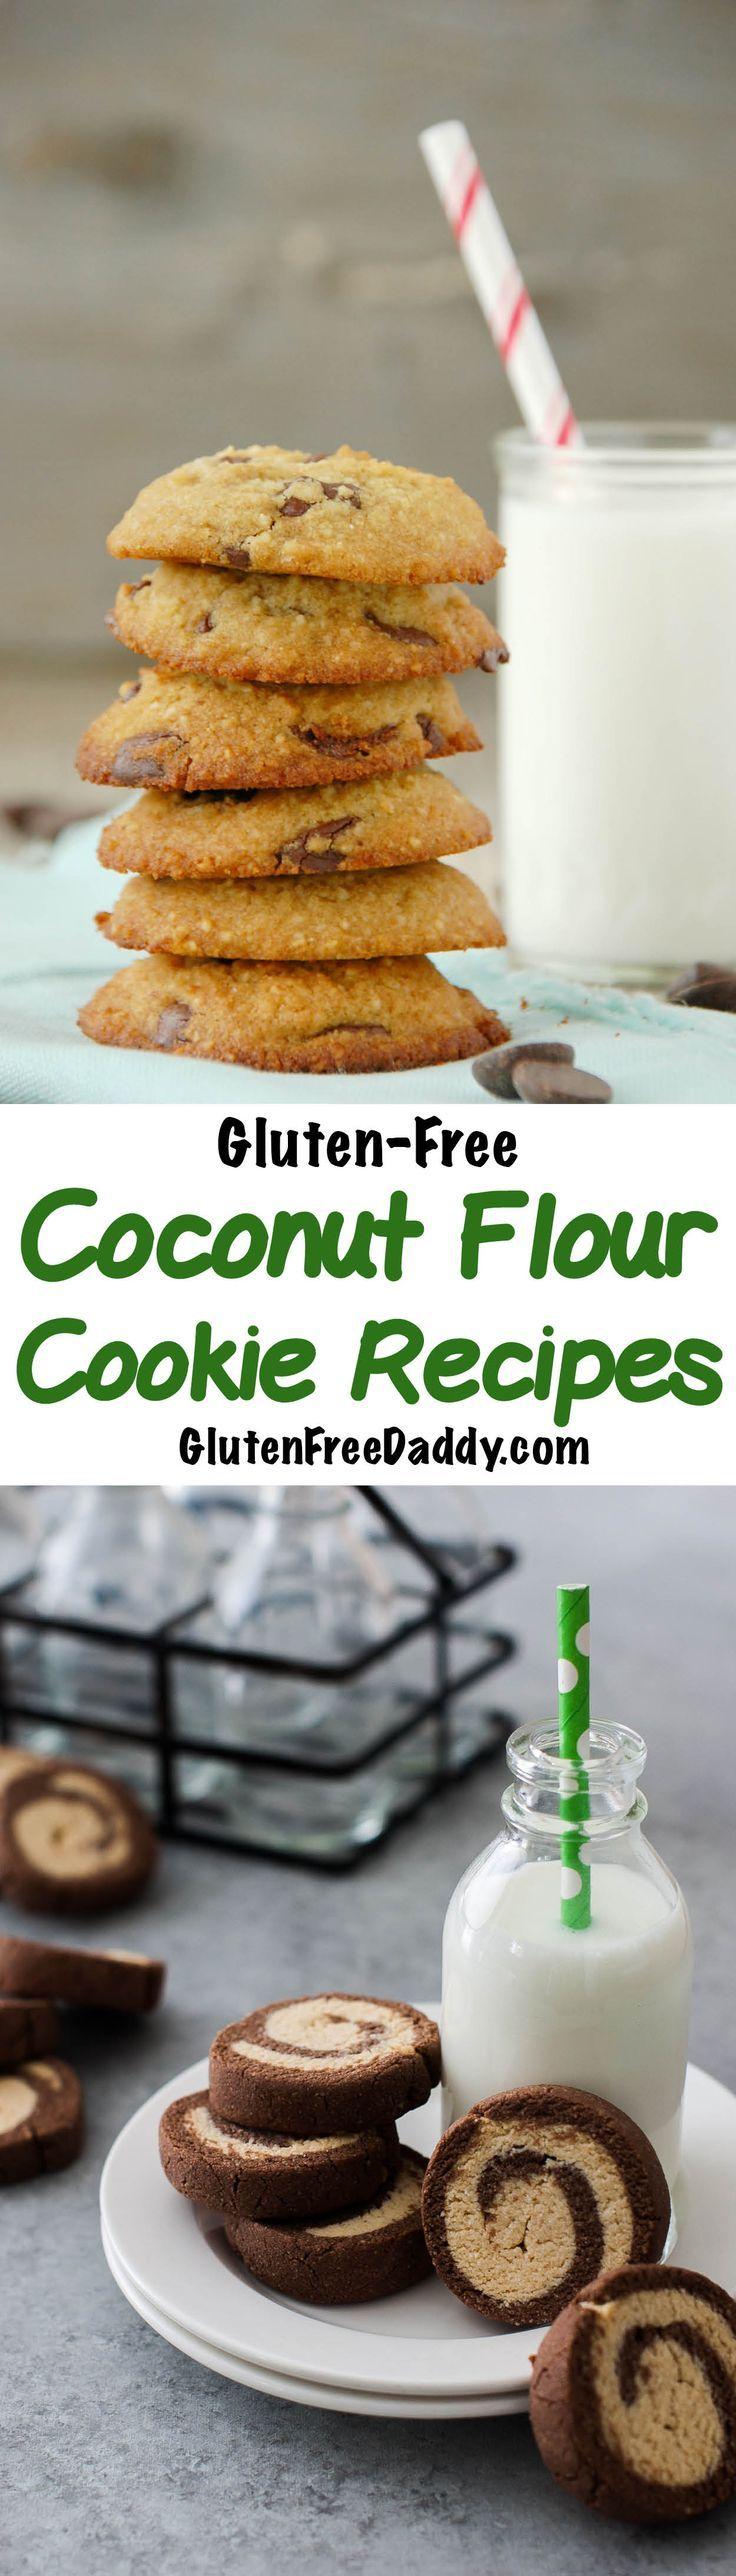 25 Gluten-Free Coconut Flour Cookie Recipes